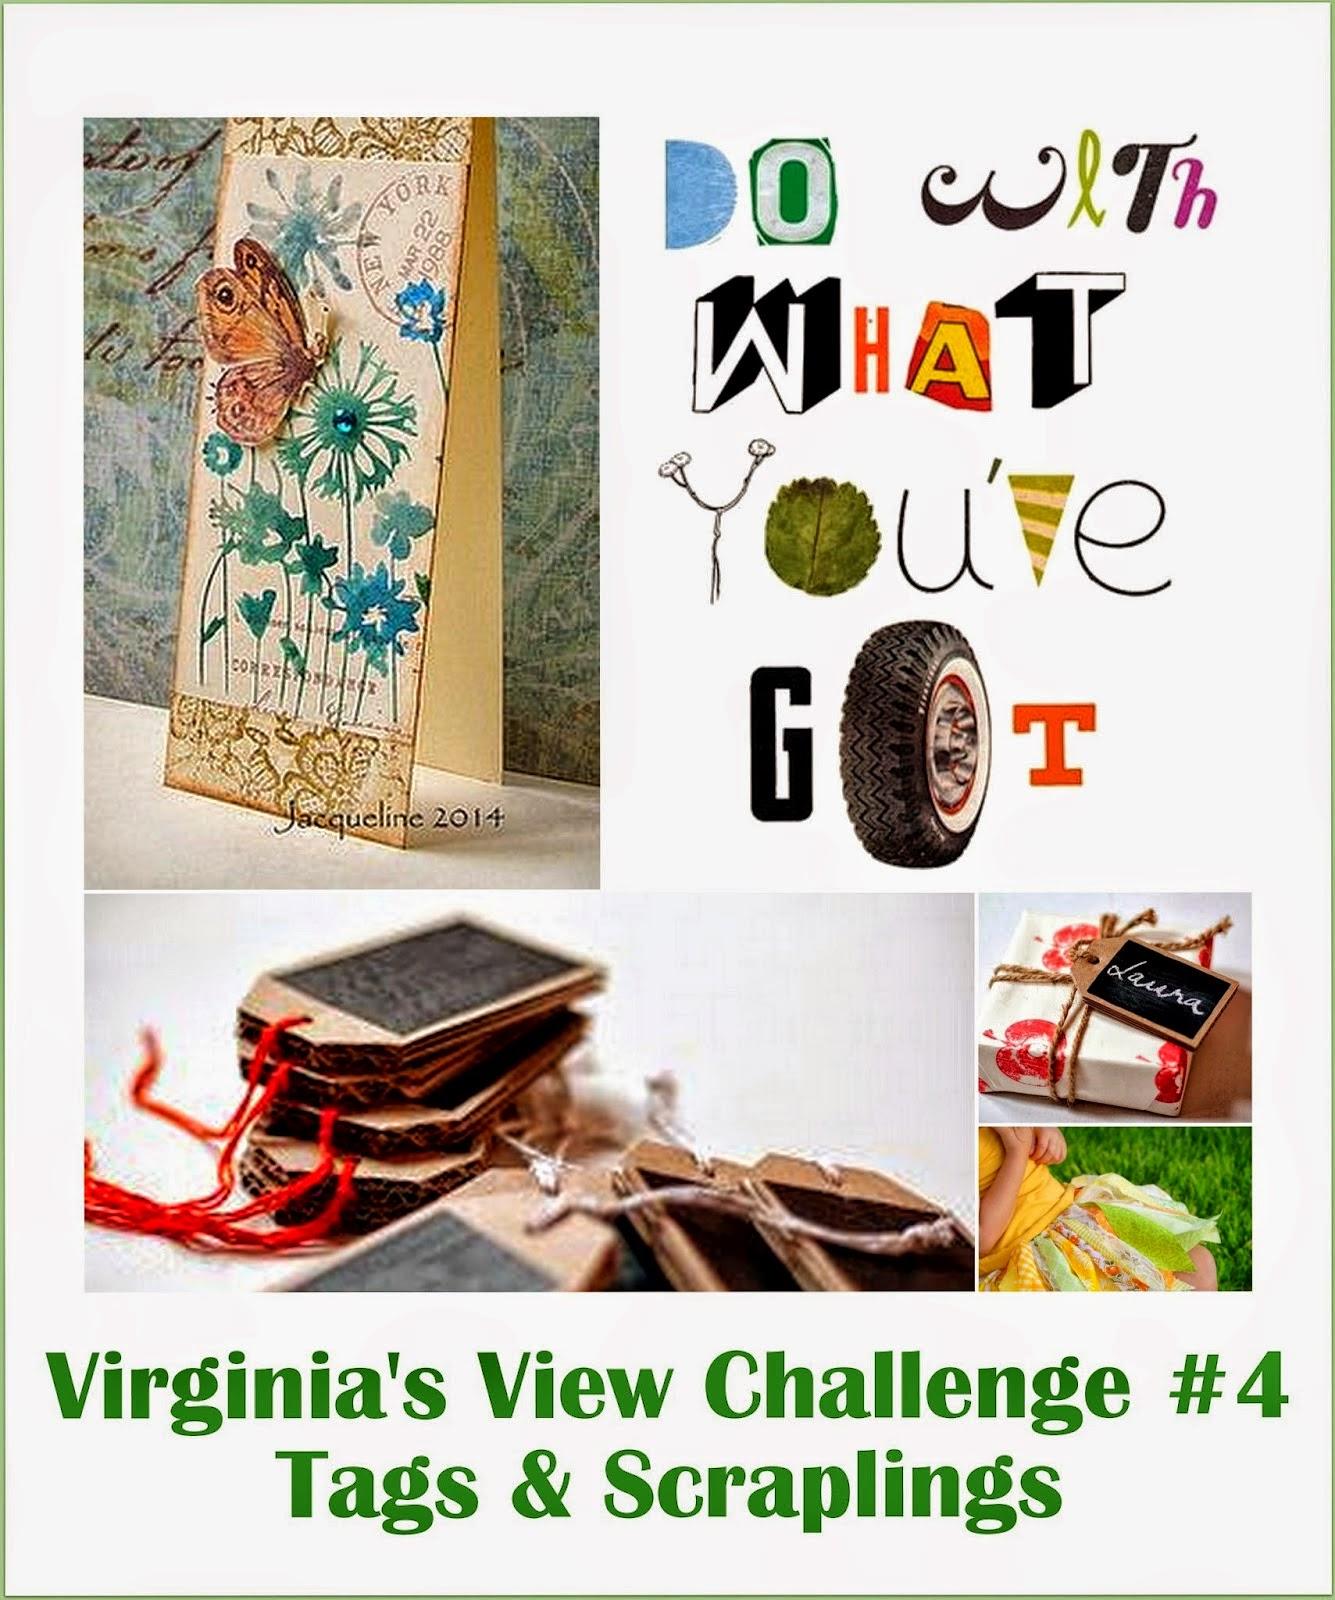 http://virginiasviewchallenge.blogspot.com.au/2014/06/virginias-view-challenge-4.html